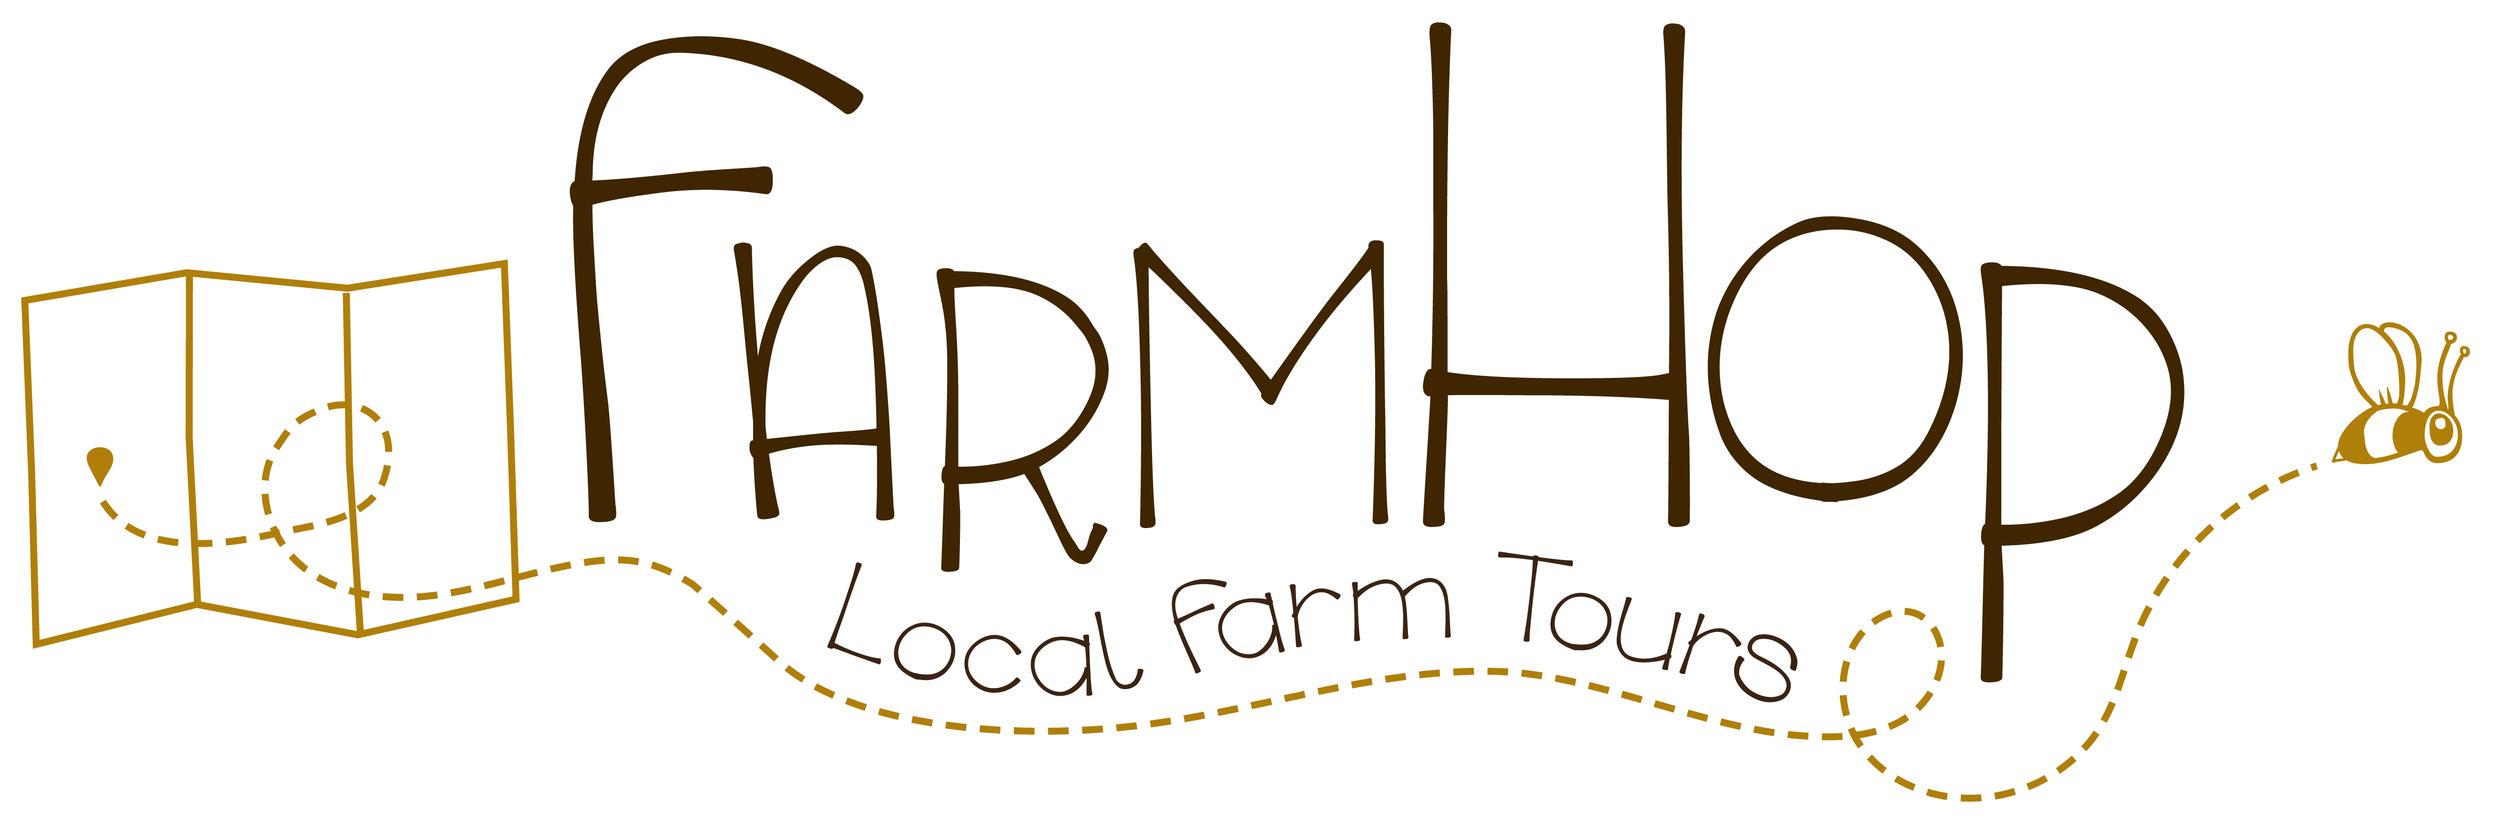 FarmHop-indiana-farm-tour.png